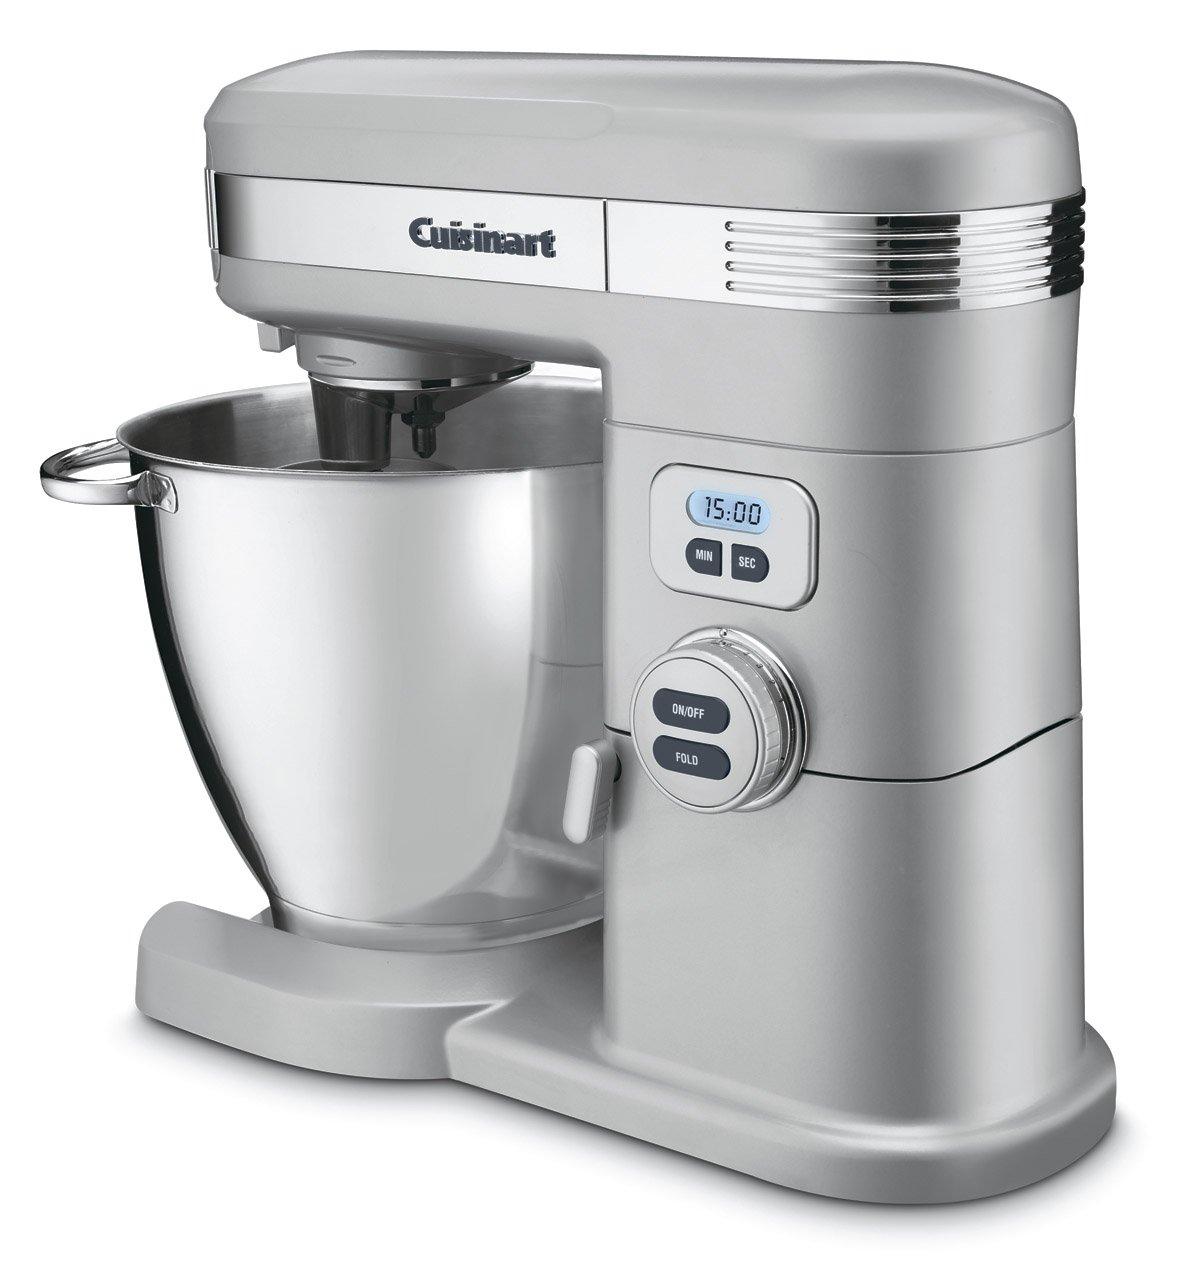 Galleon Cuisinart Sm 70bc 7 Quart 12 Speed Stand Mixer